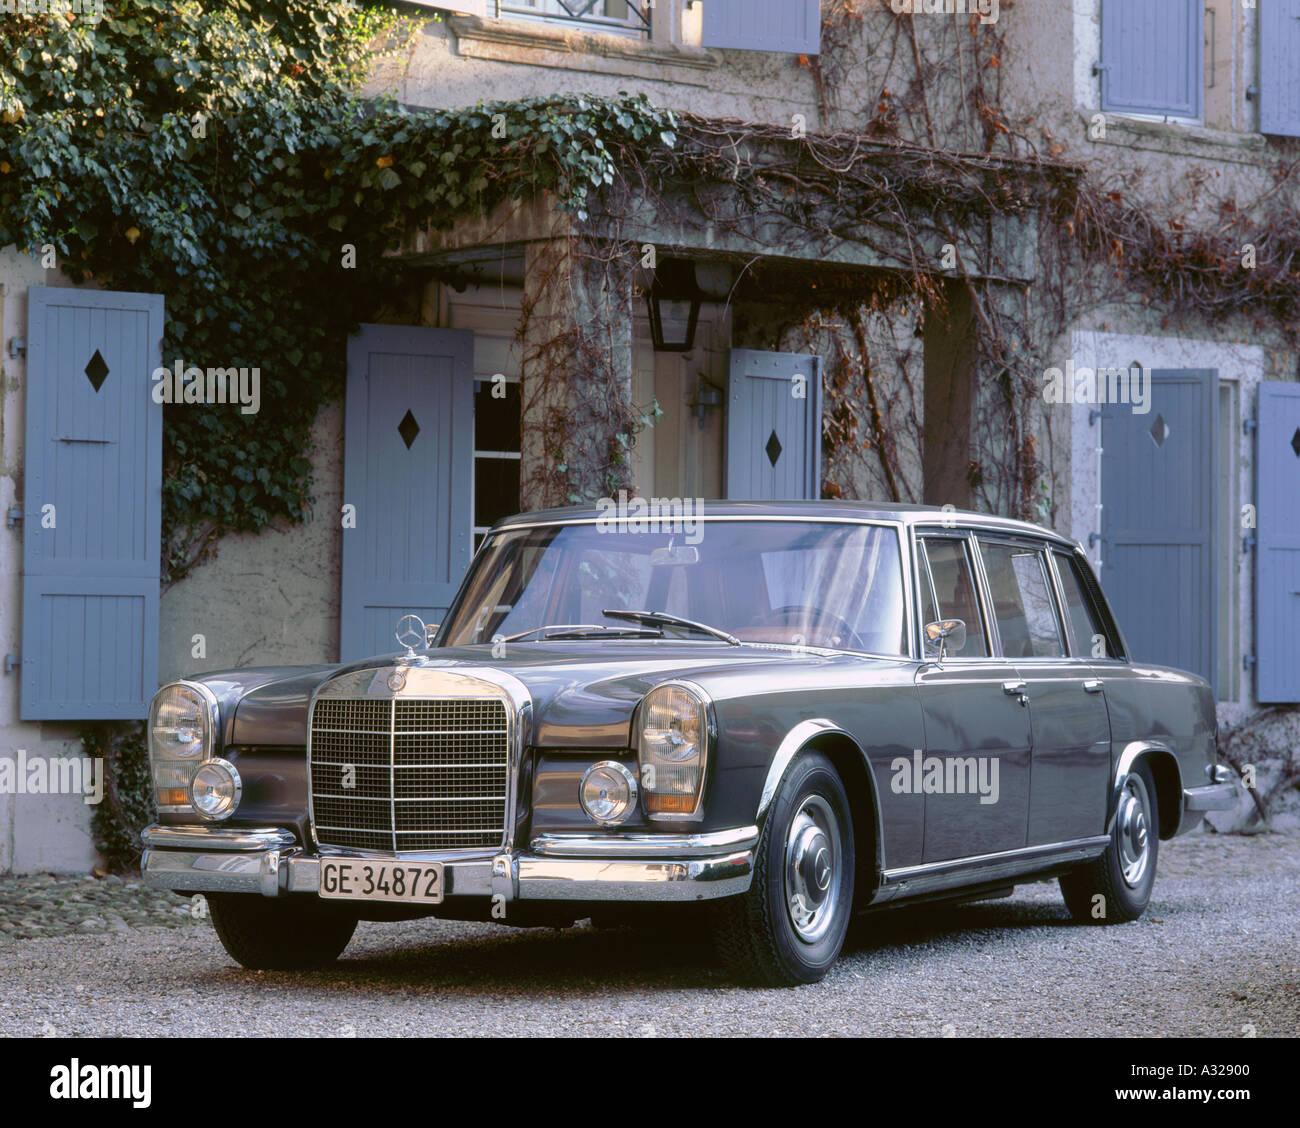 1965 Mercedes Benz 300se Sunroof Coupe Airride 280 Se 1 Of 710 Restored Srvcrecs